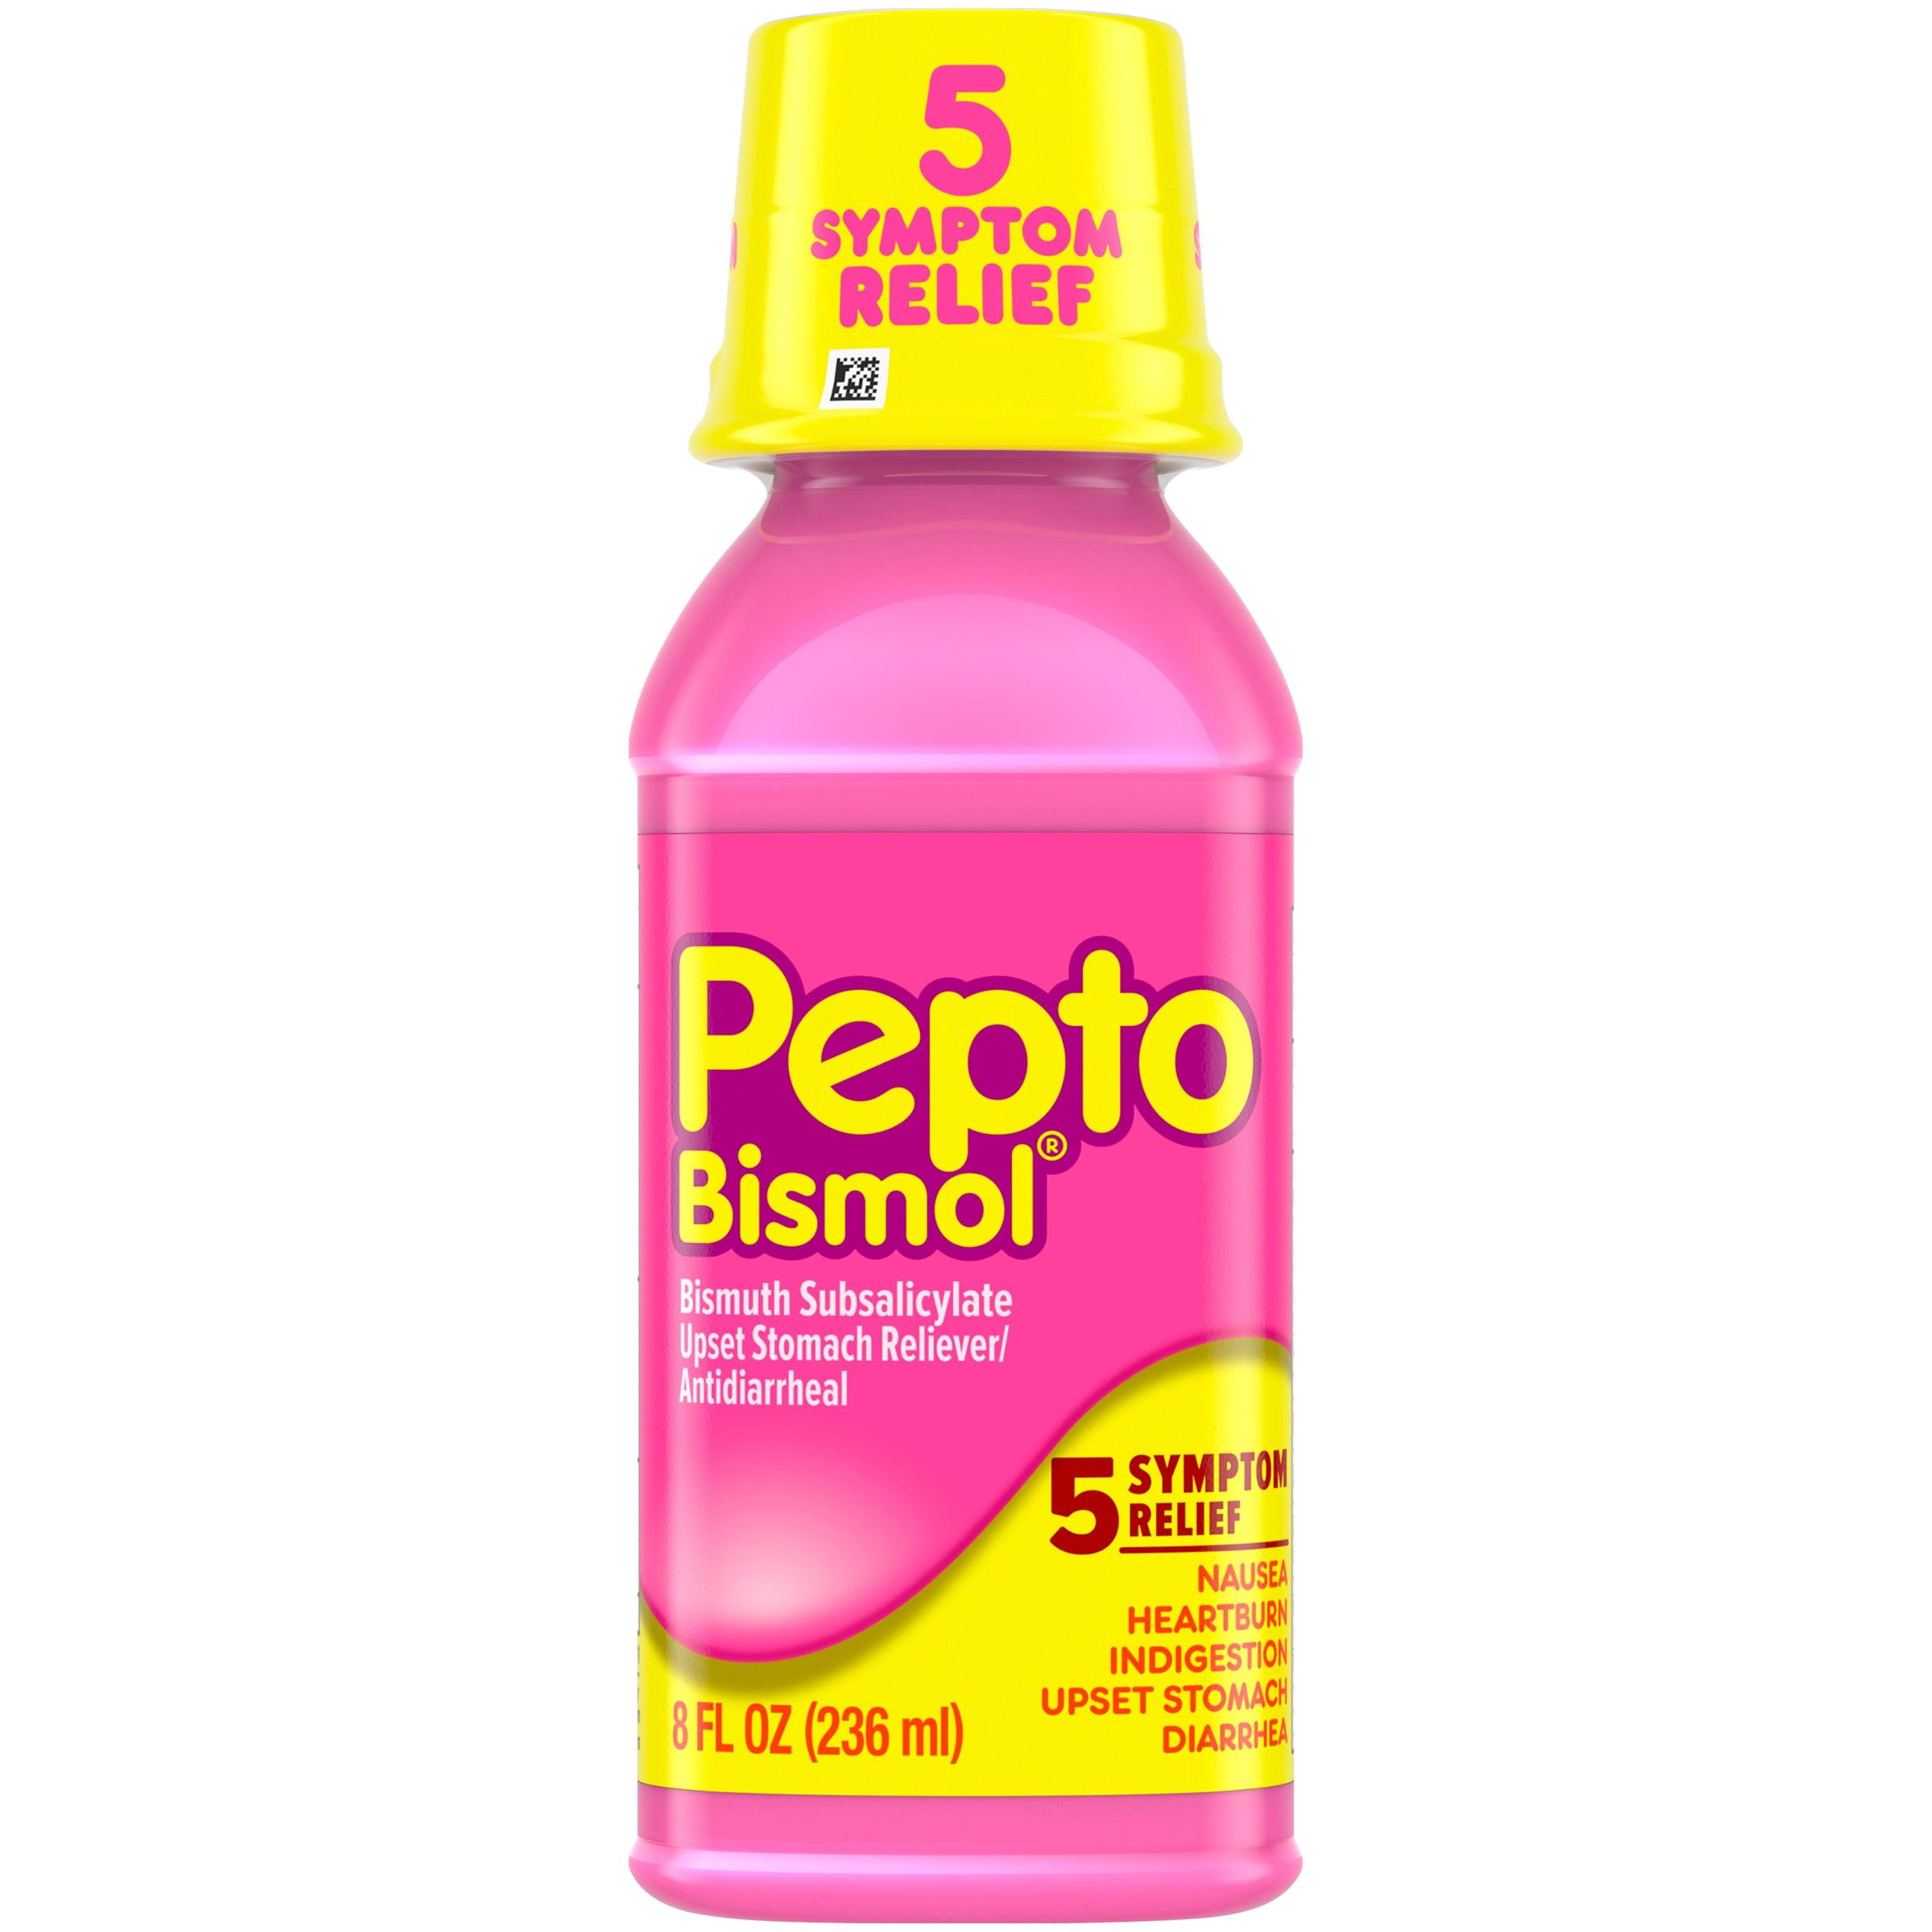 Multi-Symptom Pepto Bismol Liquid for Nausea, Heartburn, Indigestion, Upset Stomach, and Diarrhea Relief, Original Flavor 8 oz